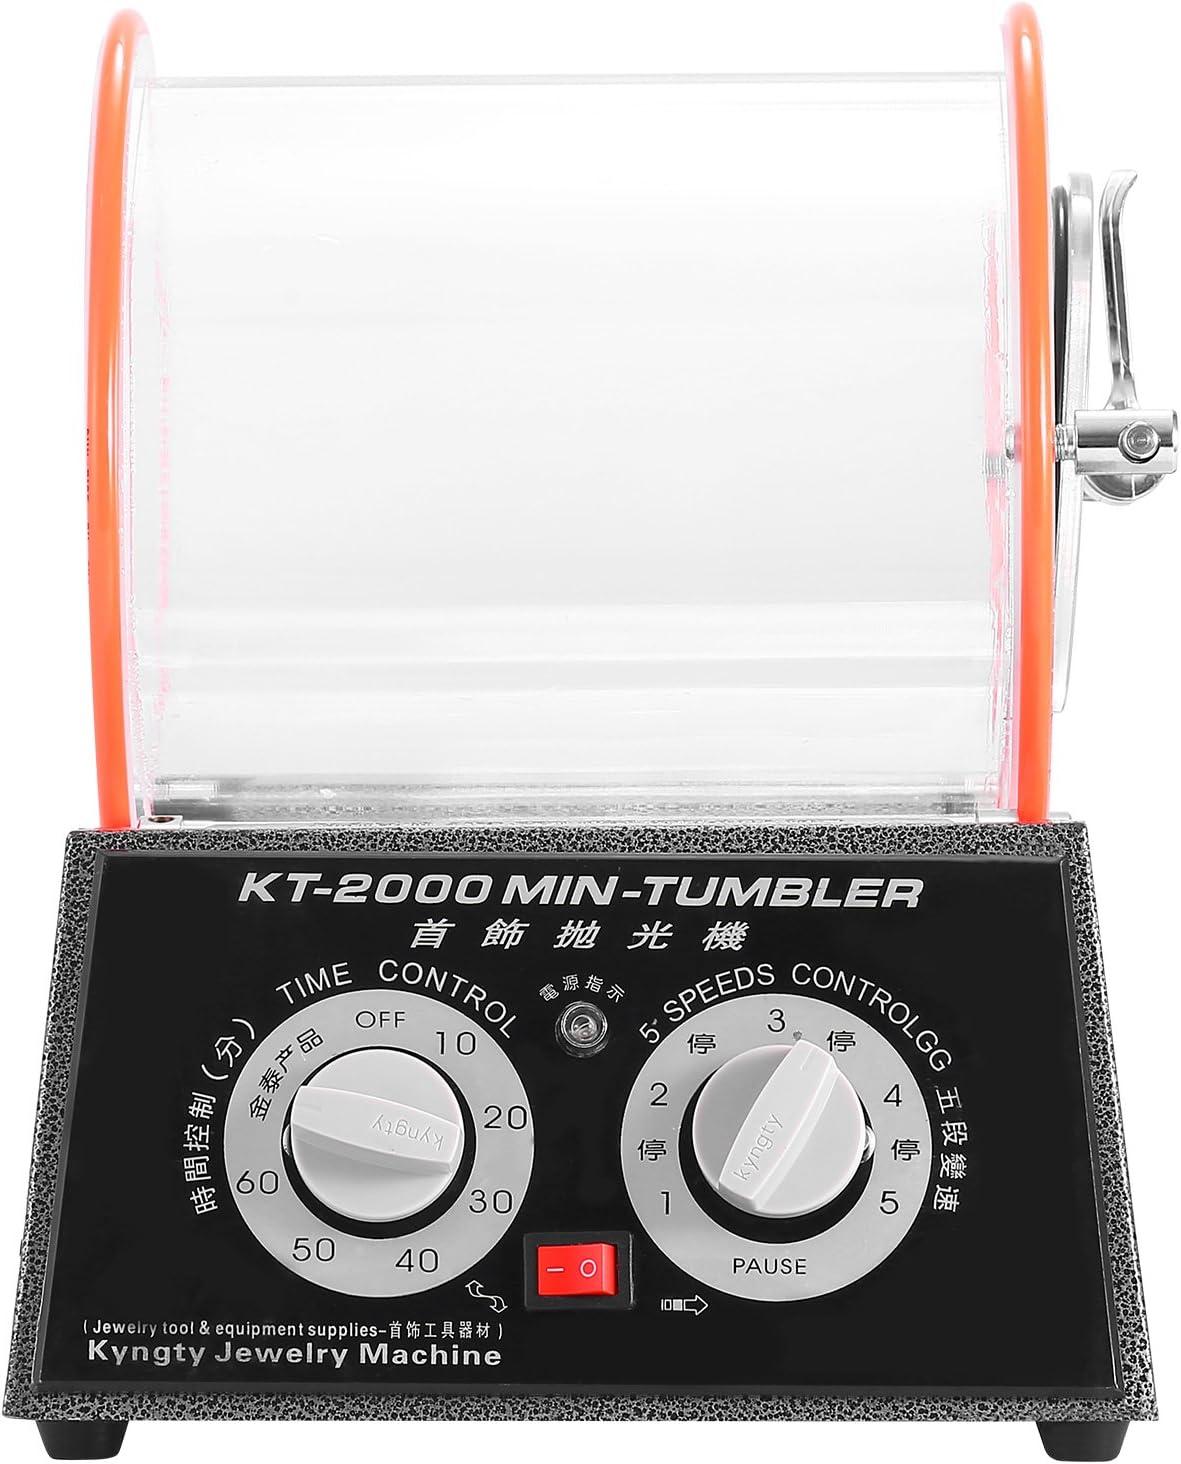 Best Tumbler For Jewelry Polishing